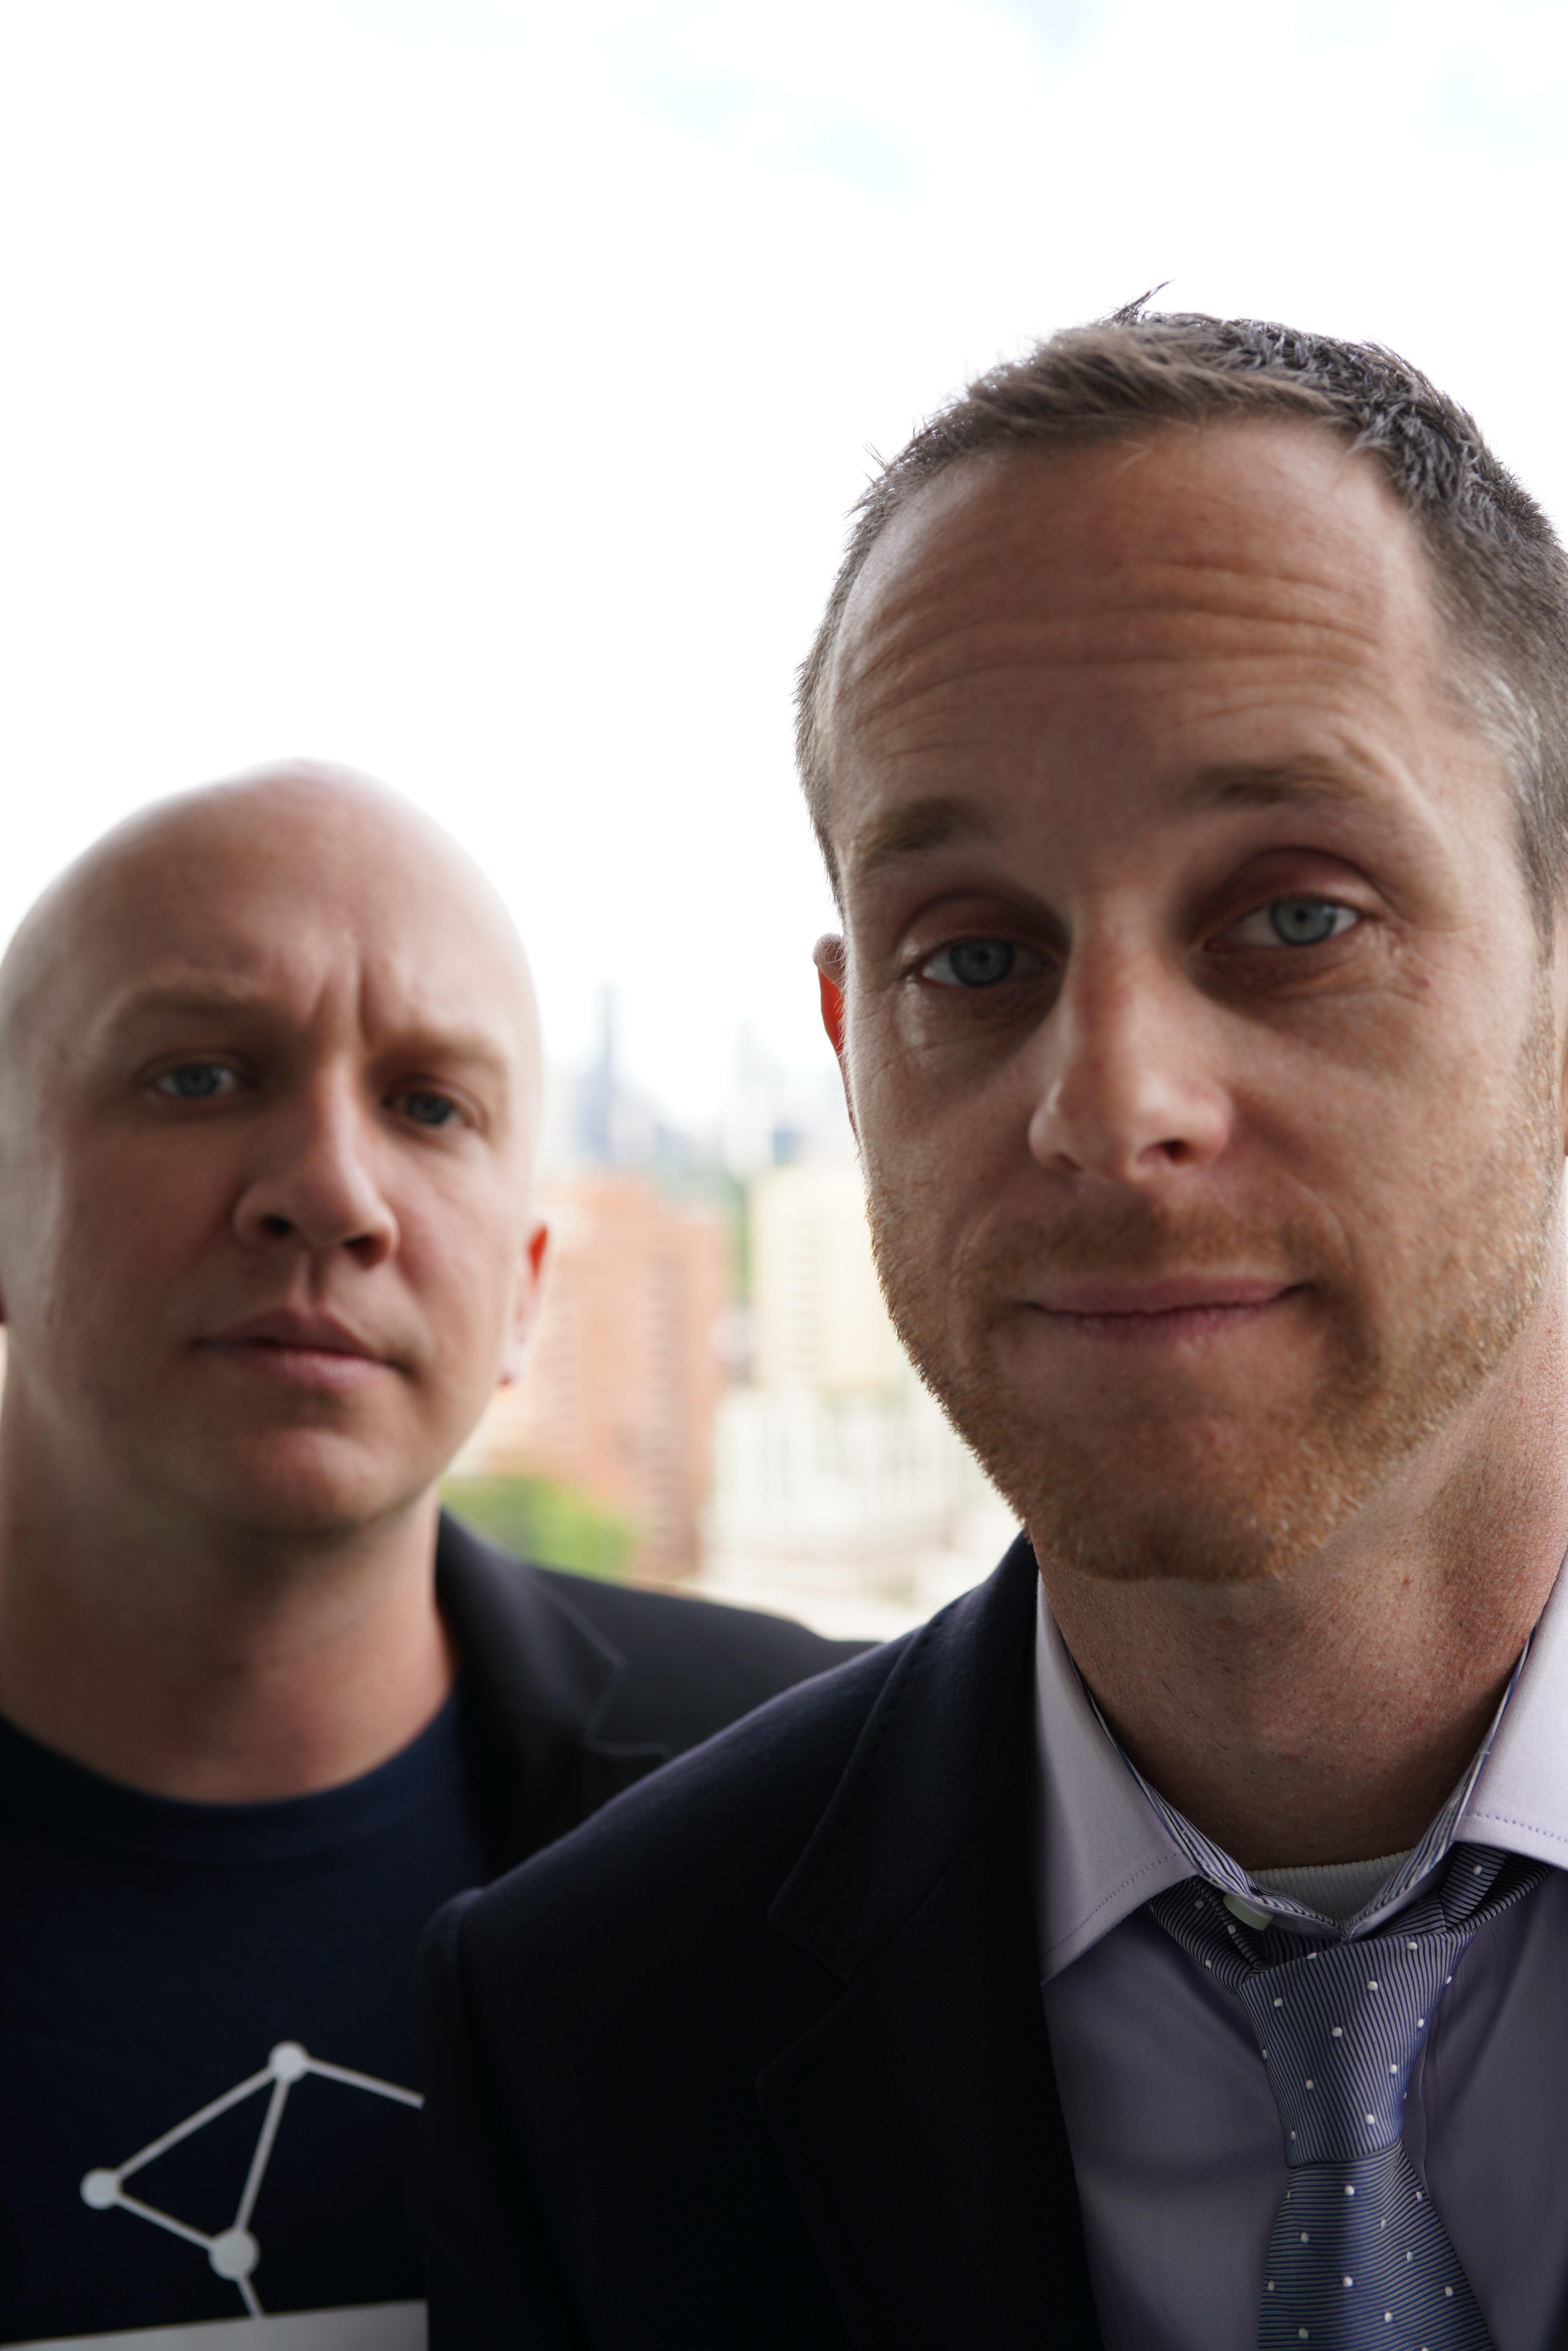 Ben Wells & Lee Kagan